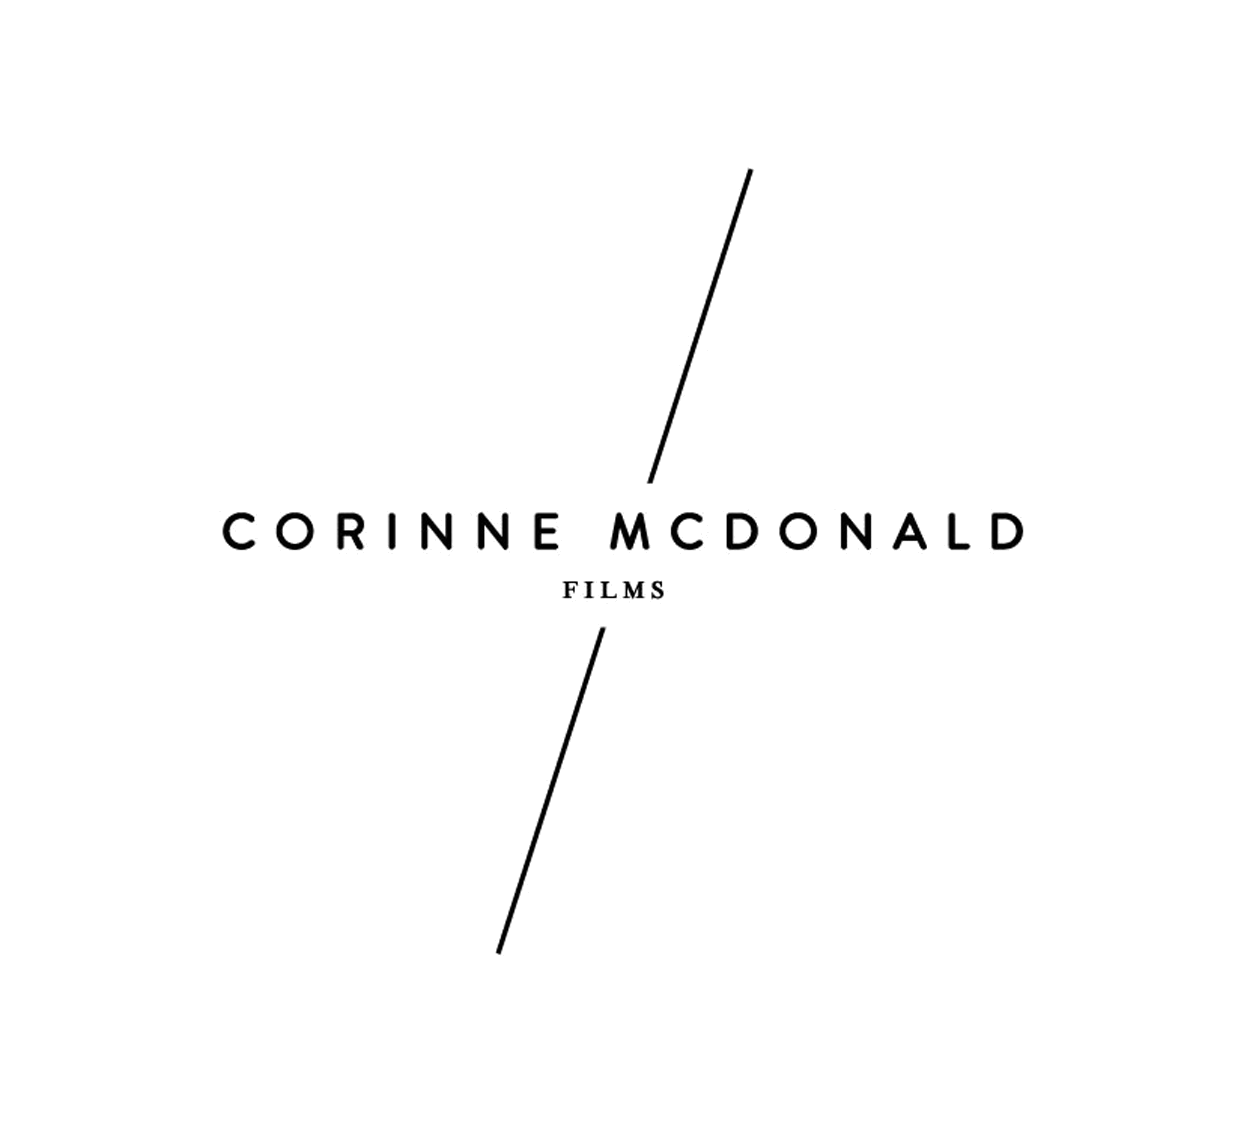 event-corrinemcdonald.png